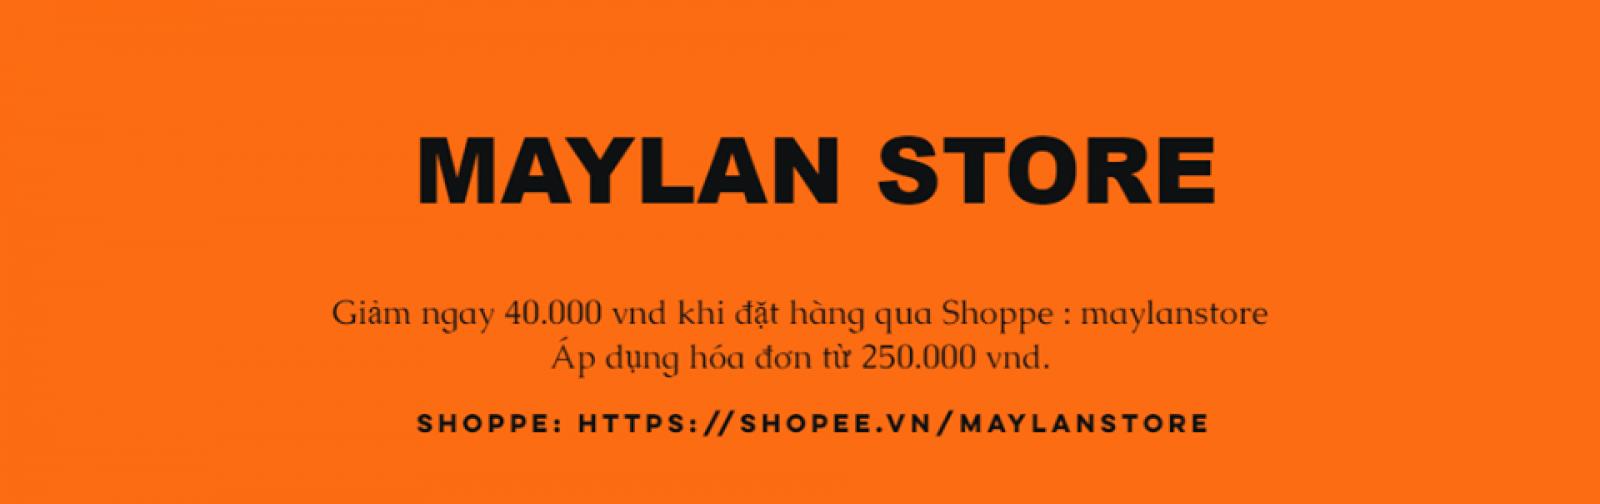 MAYLAN STORE